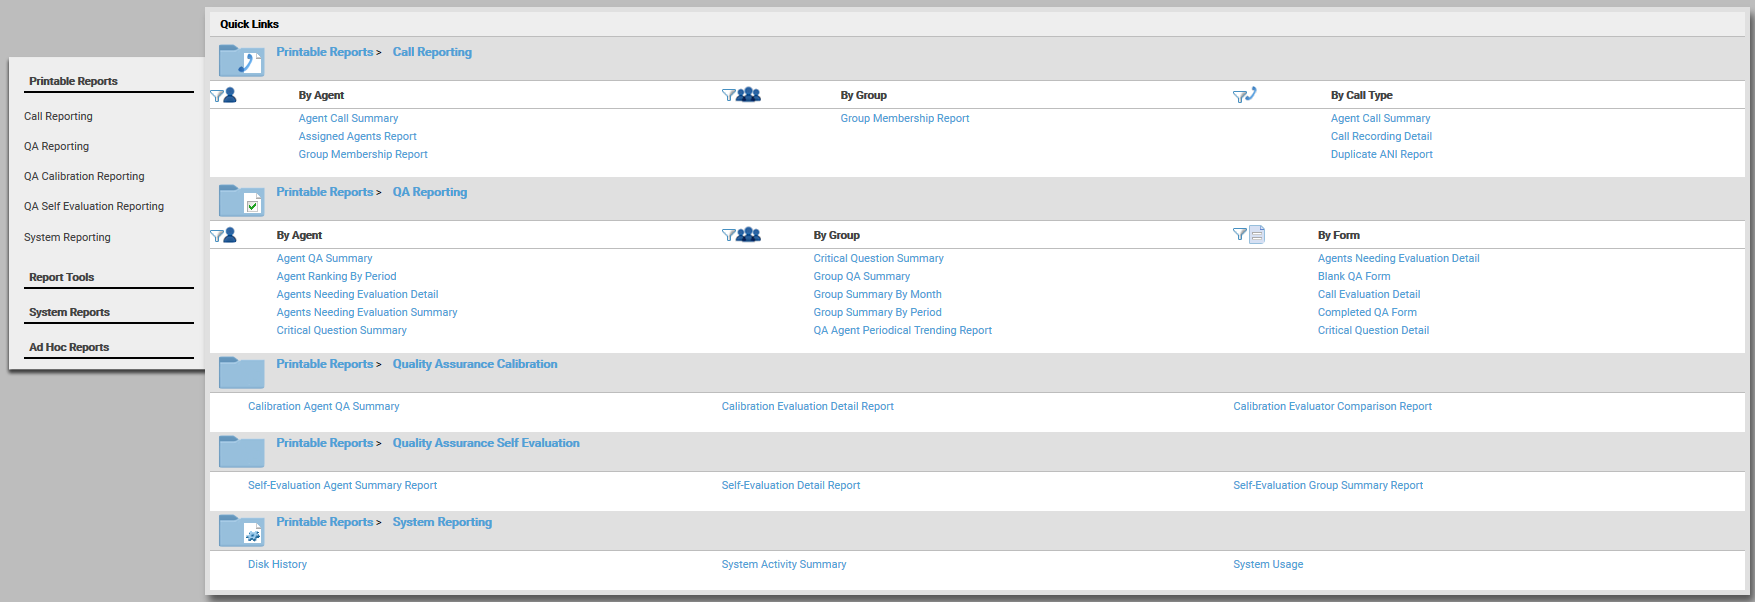 Printable Reports Page